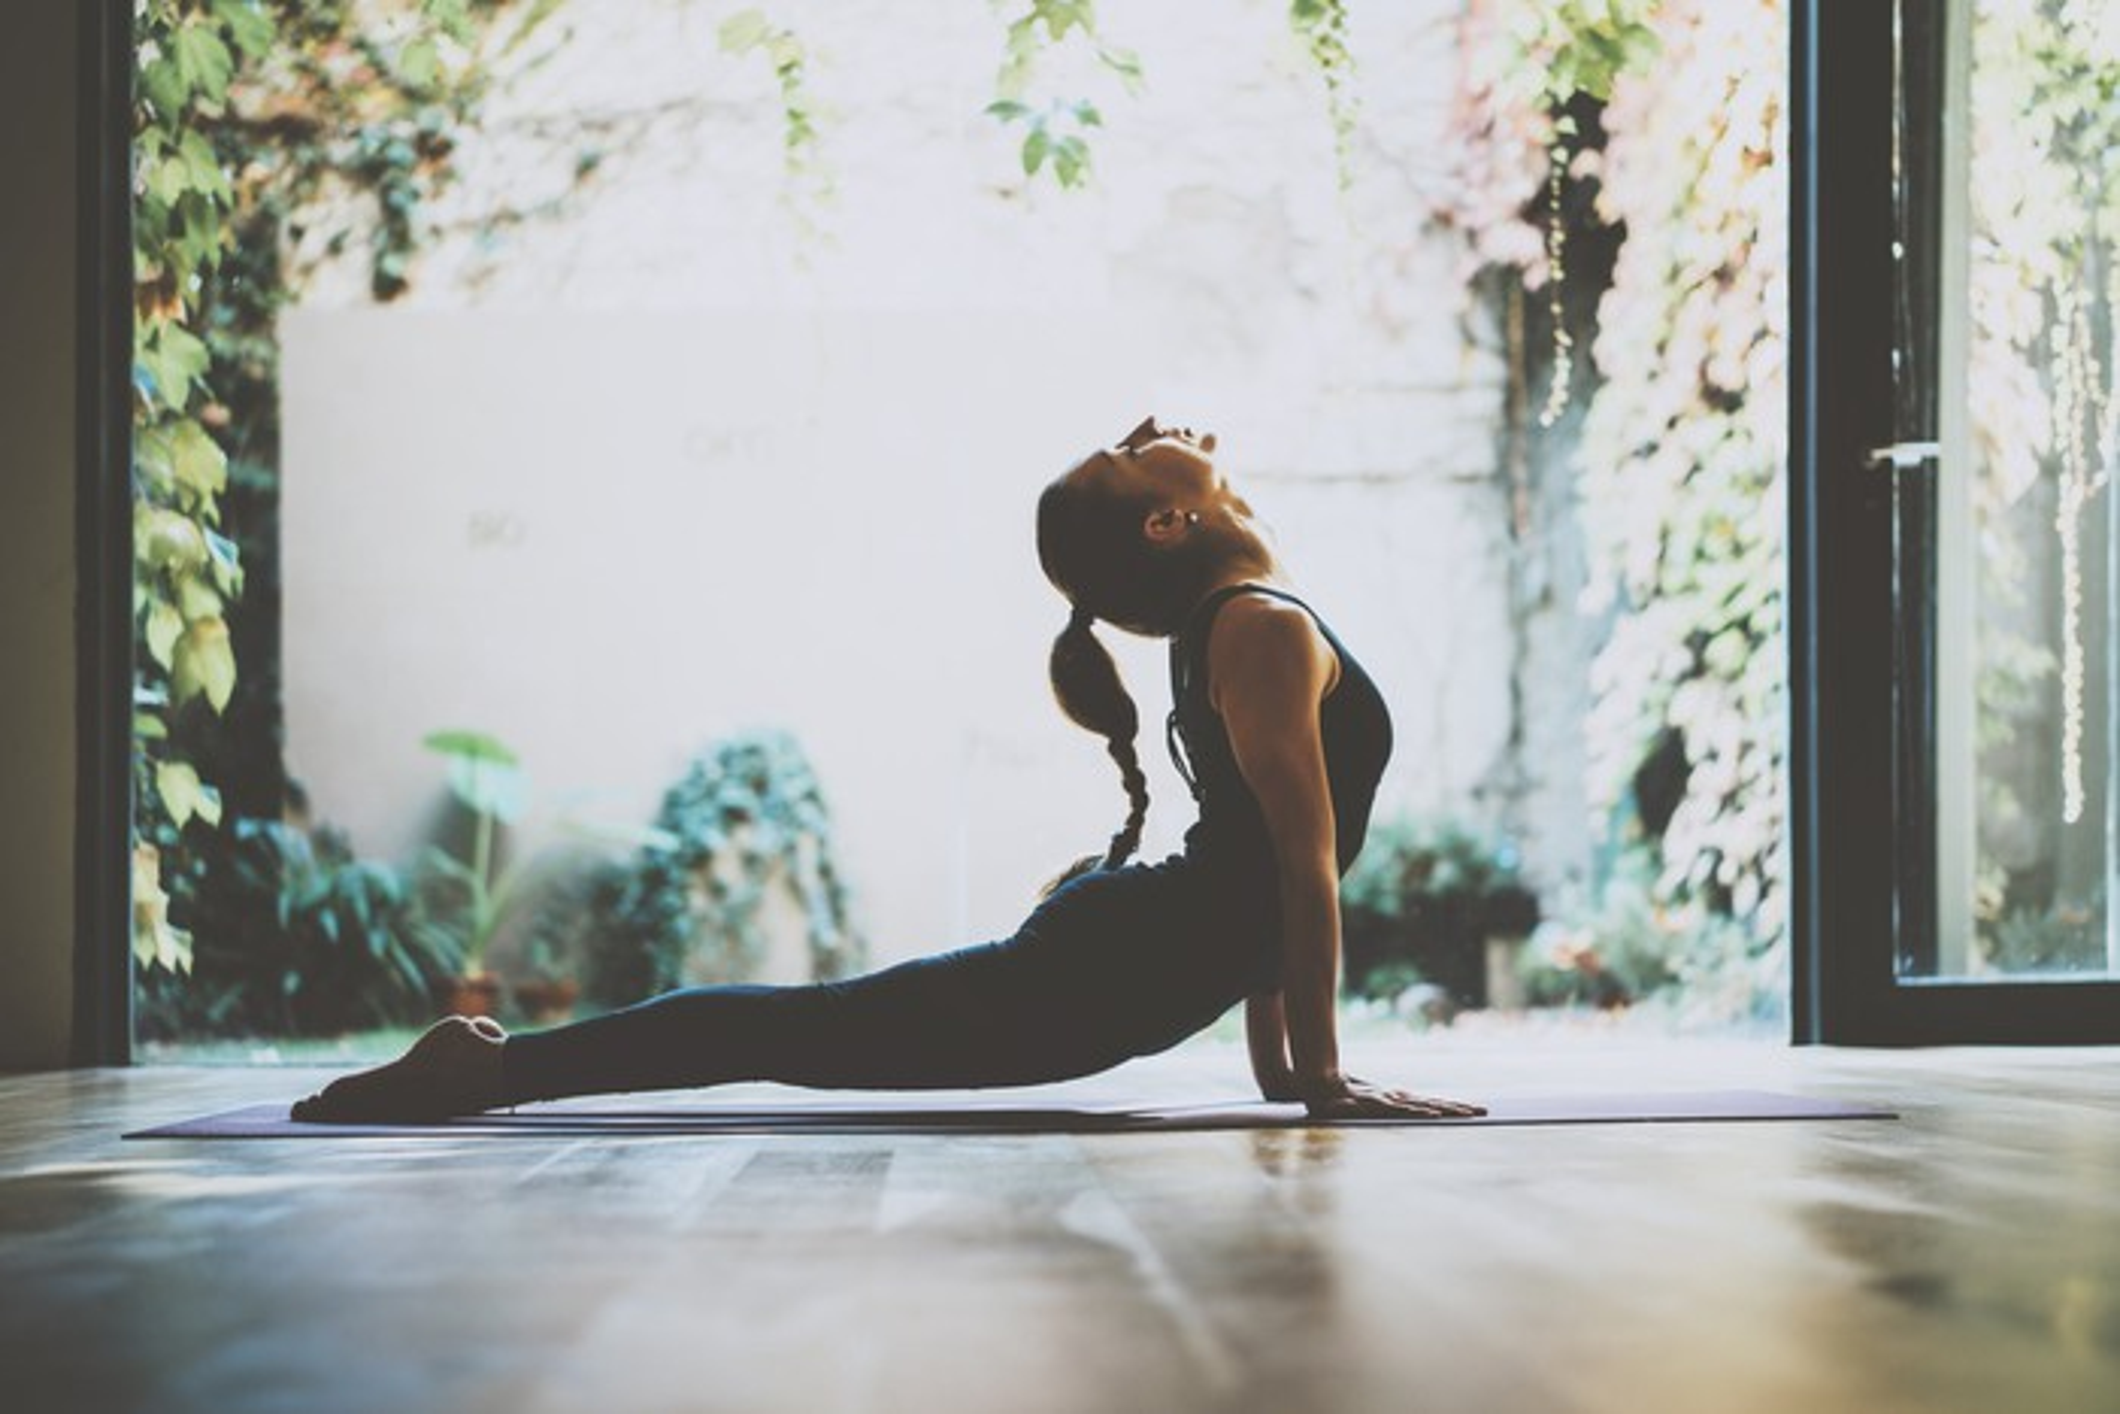 Lady doing yoga stretch